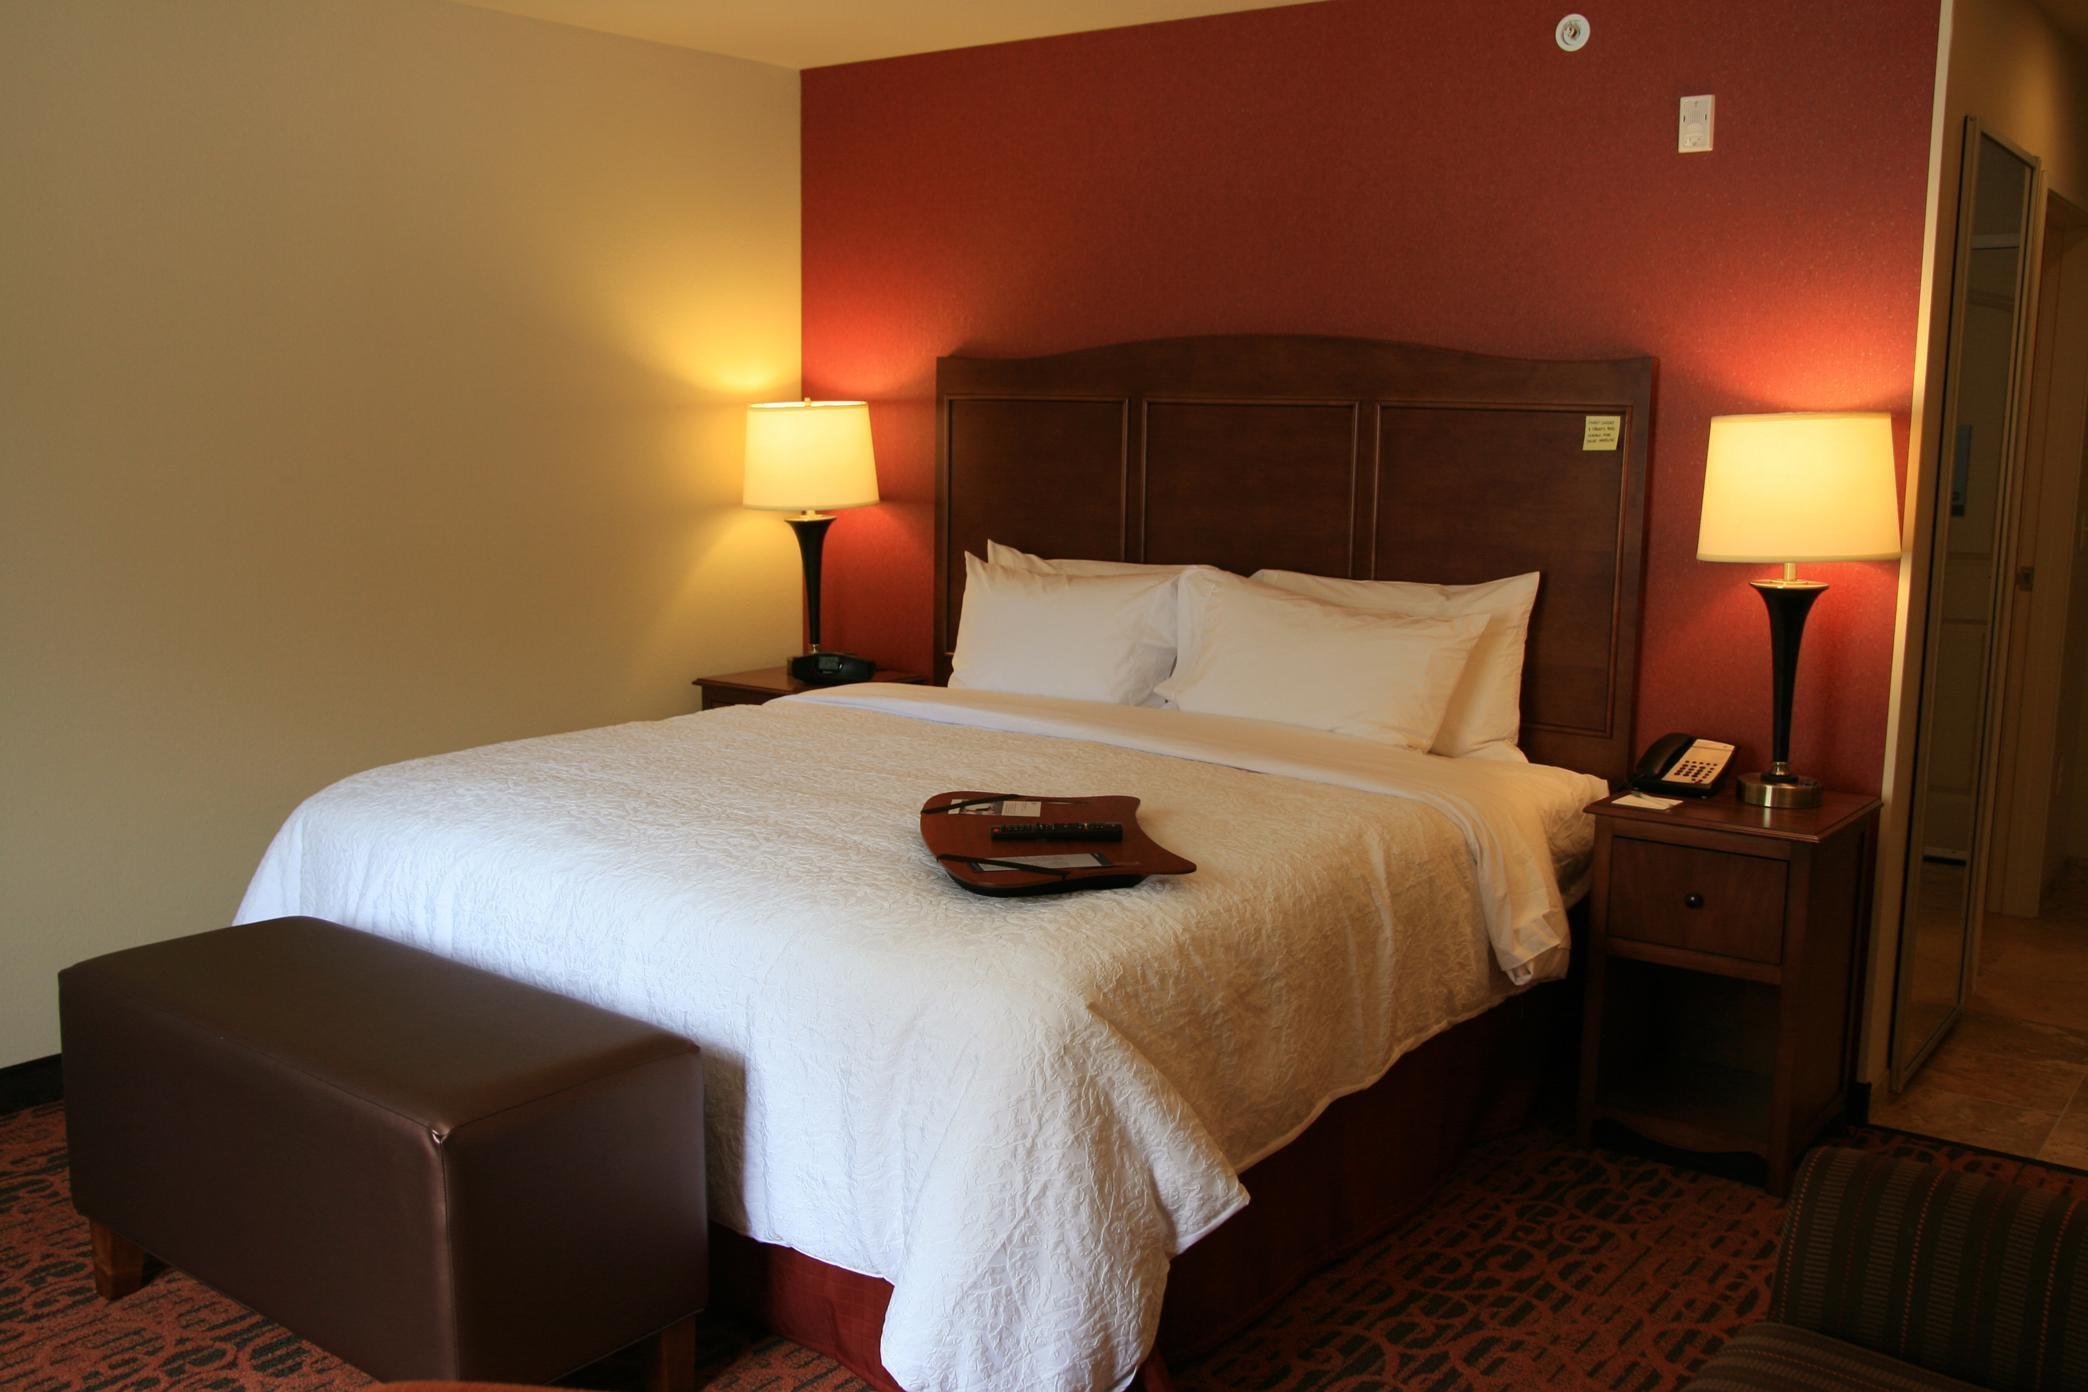 Hampton Inn & Suites Seattle-Airport/28th Ave image 4